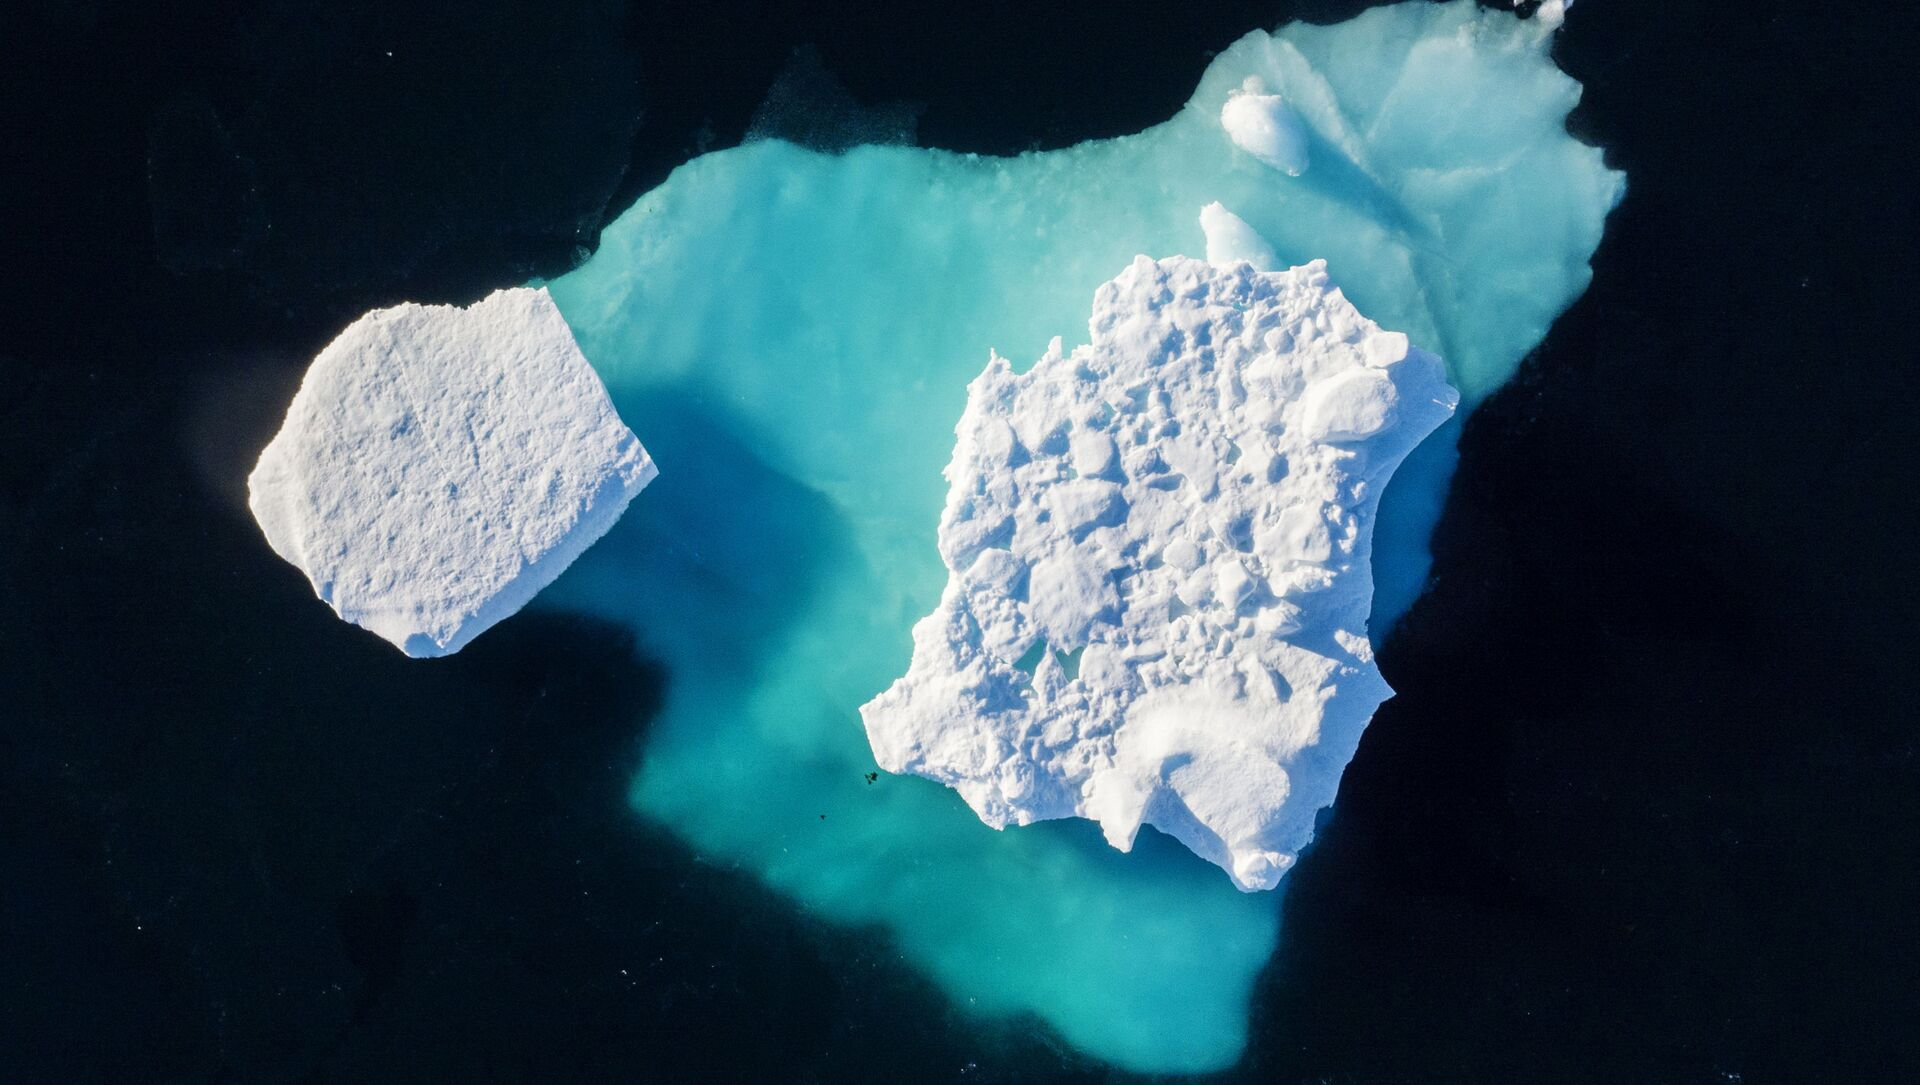 Un iceberg - Sputnik Italia, 1920, 27.02.2021